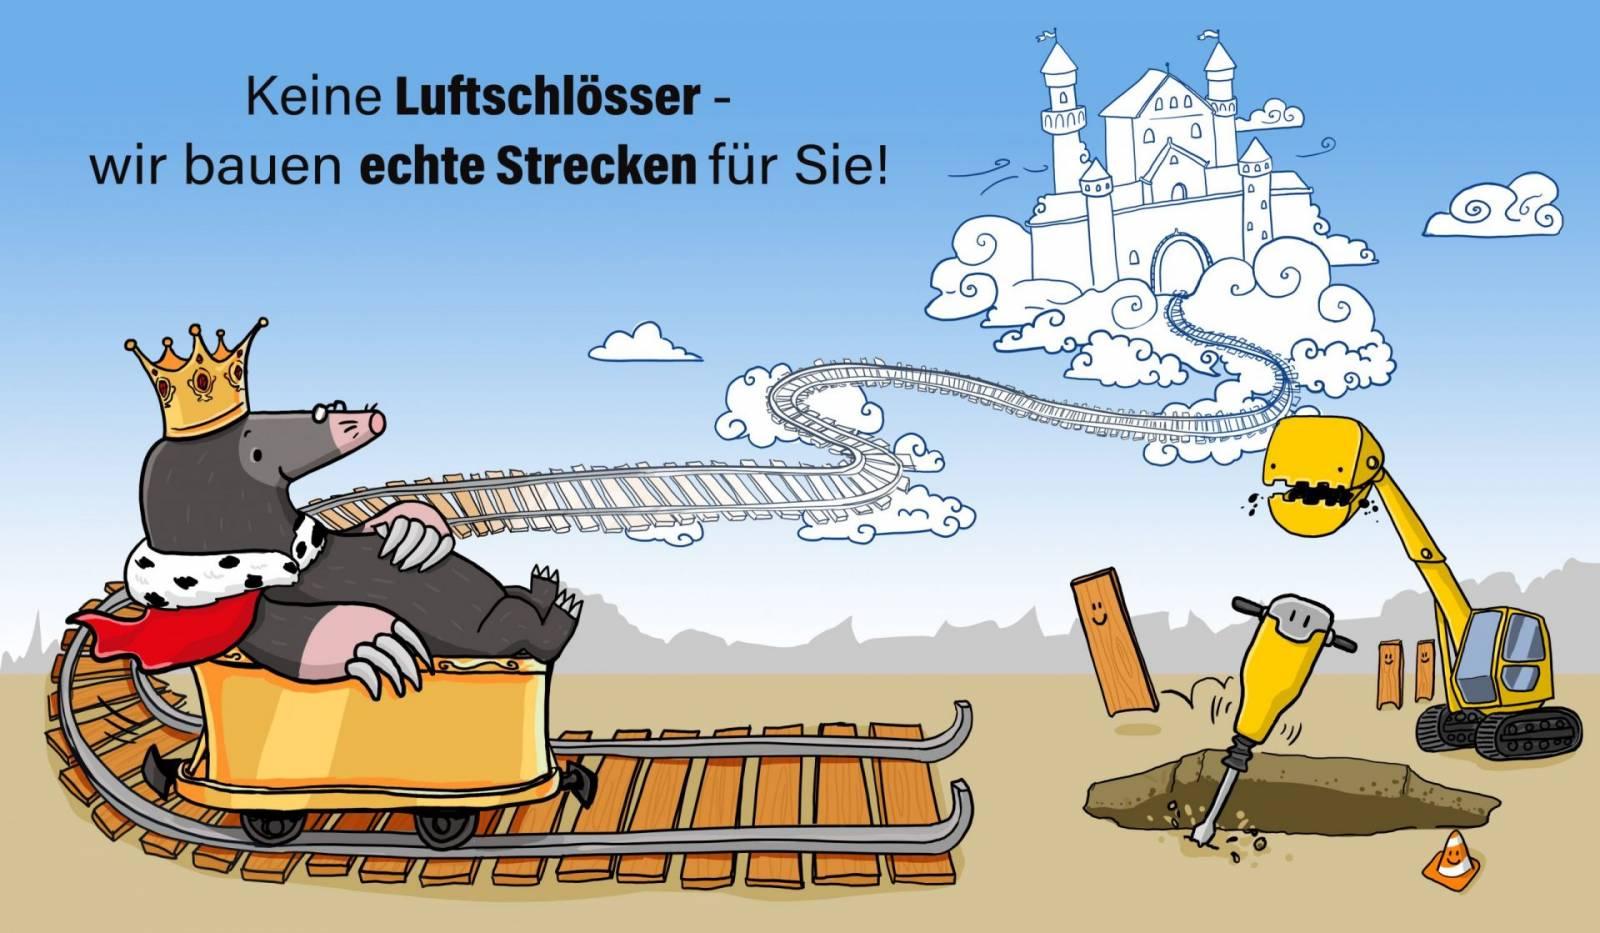 Maulwurf Luftschloss König Baustelle Illustration